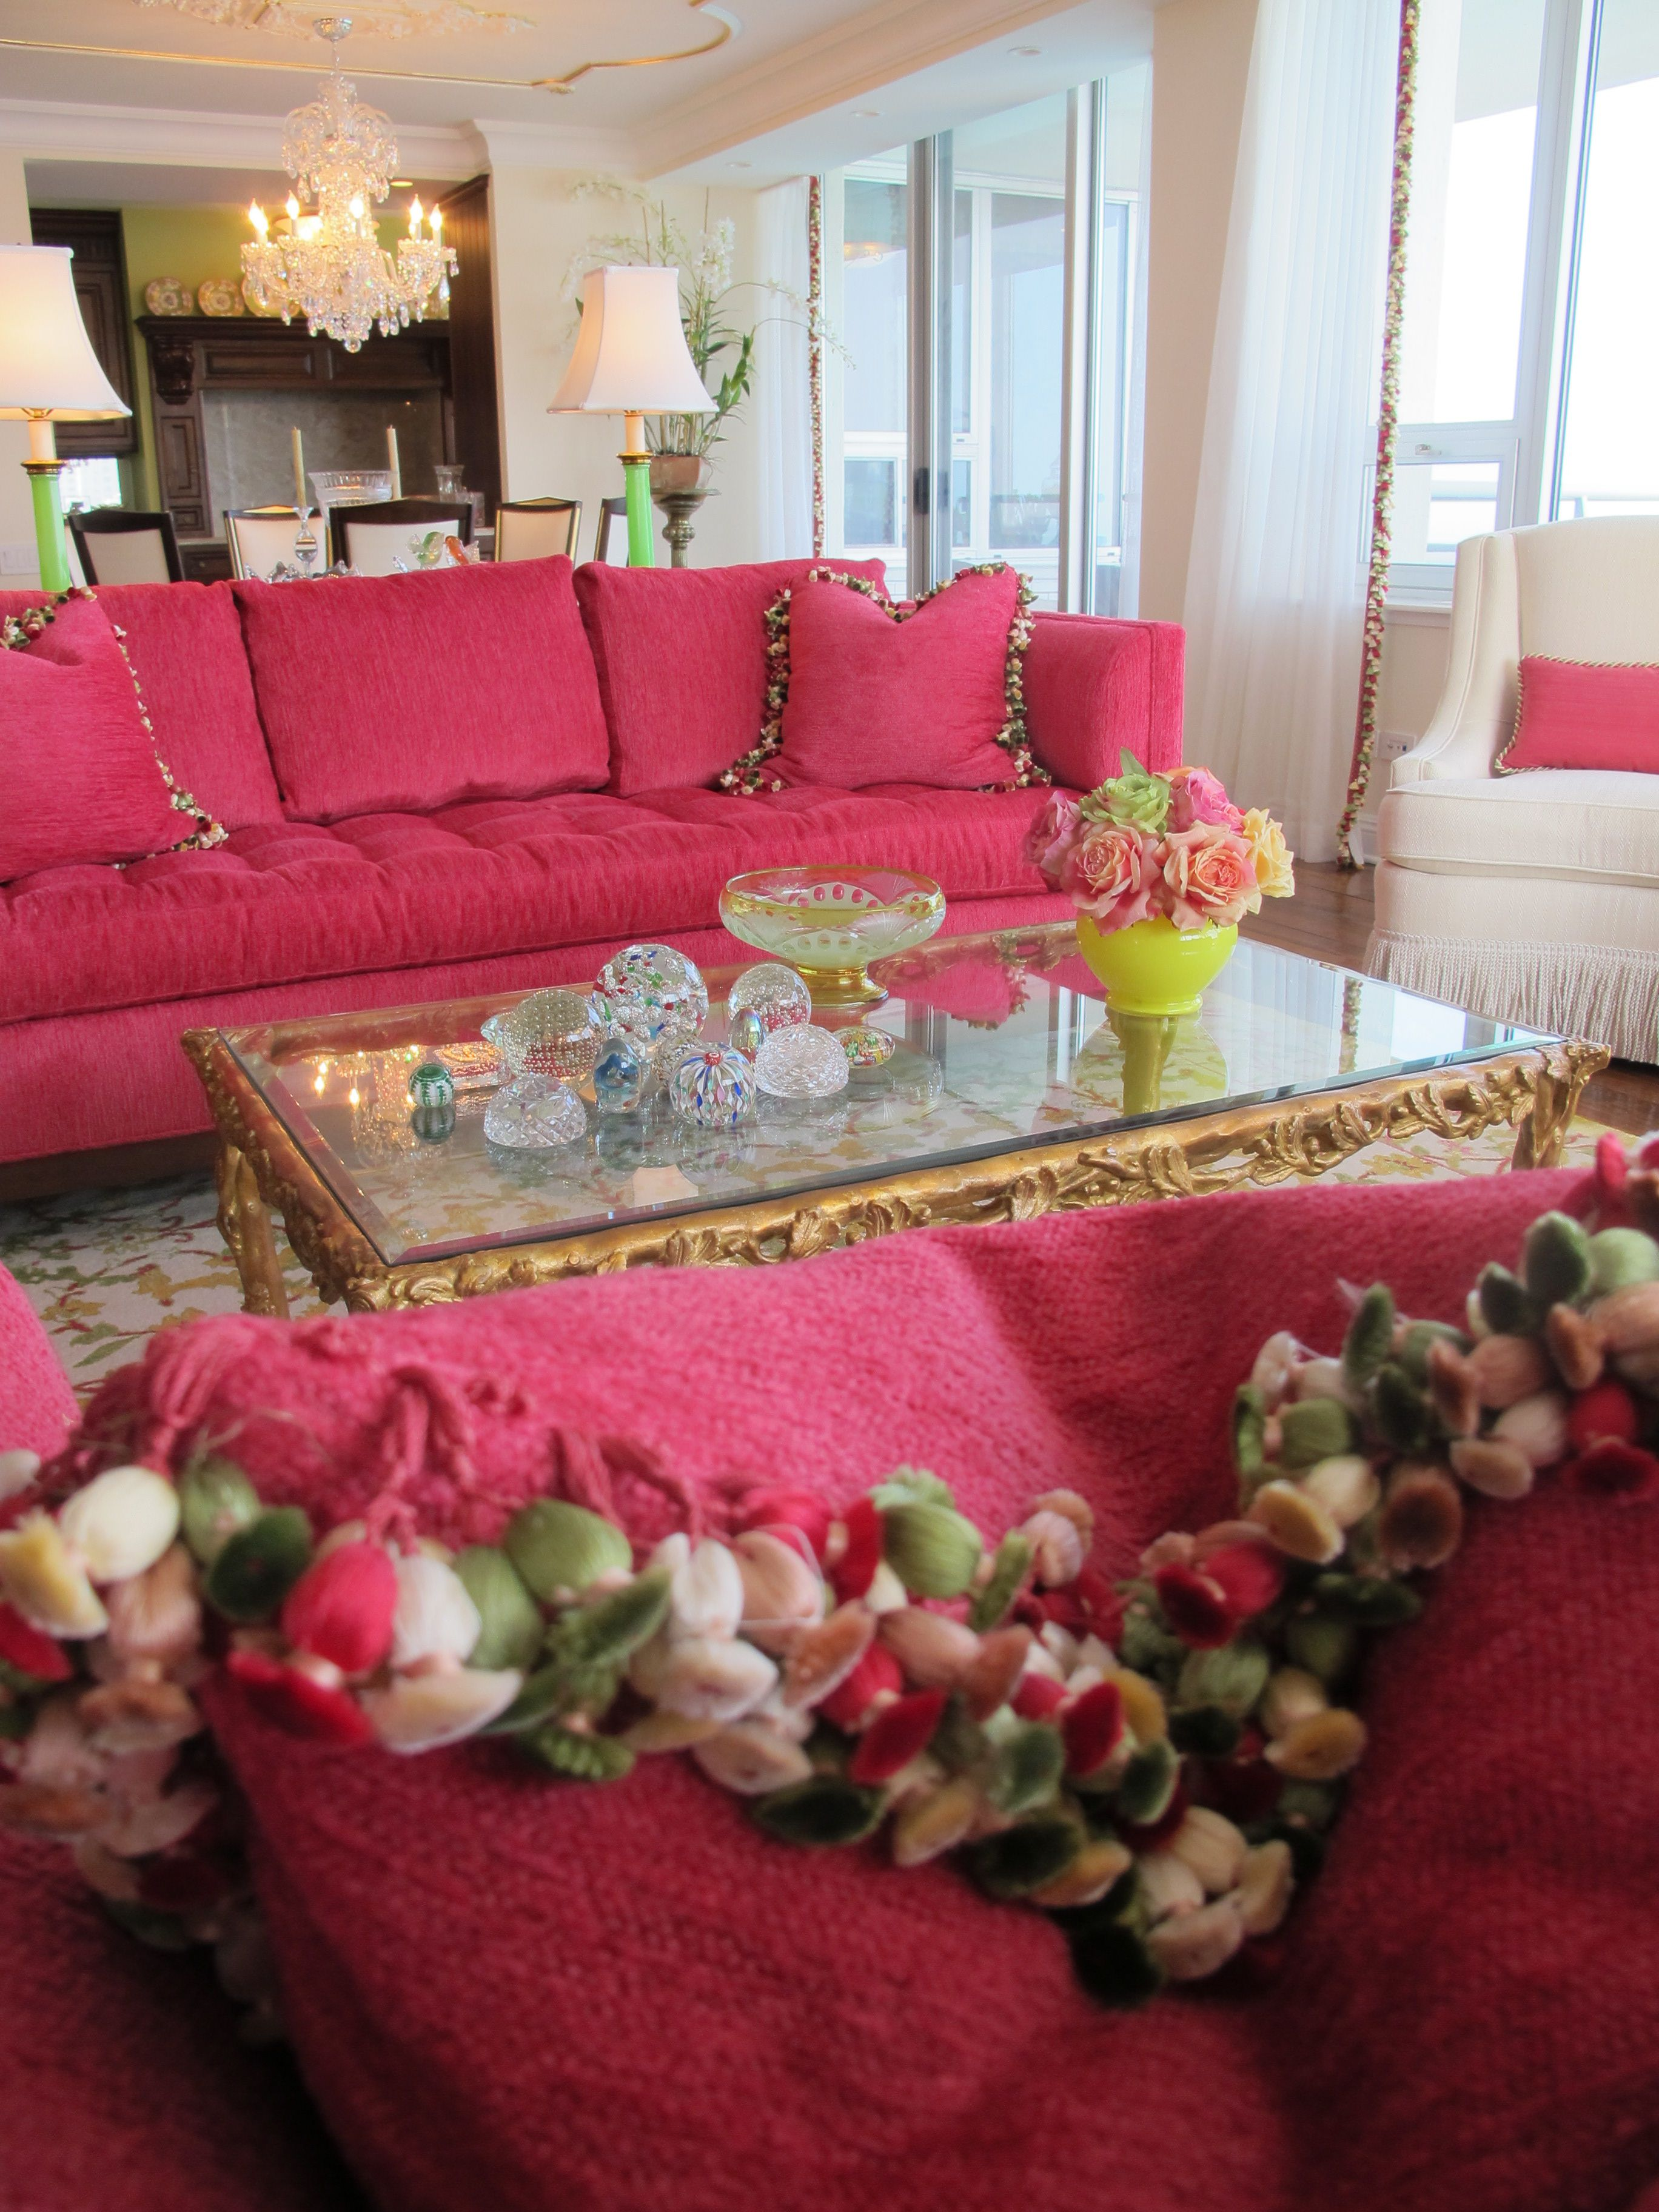 Gorgeous Raspberry Sofa Fantastic To The Touch Raspberry Sofa Pillows Throw Pillows